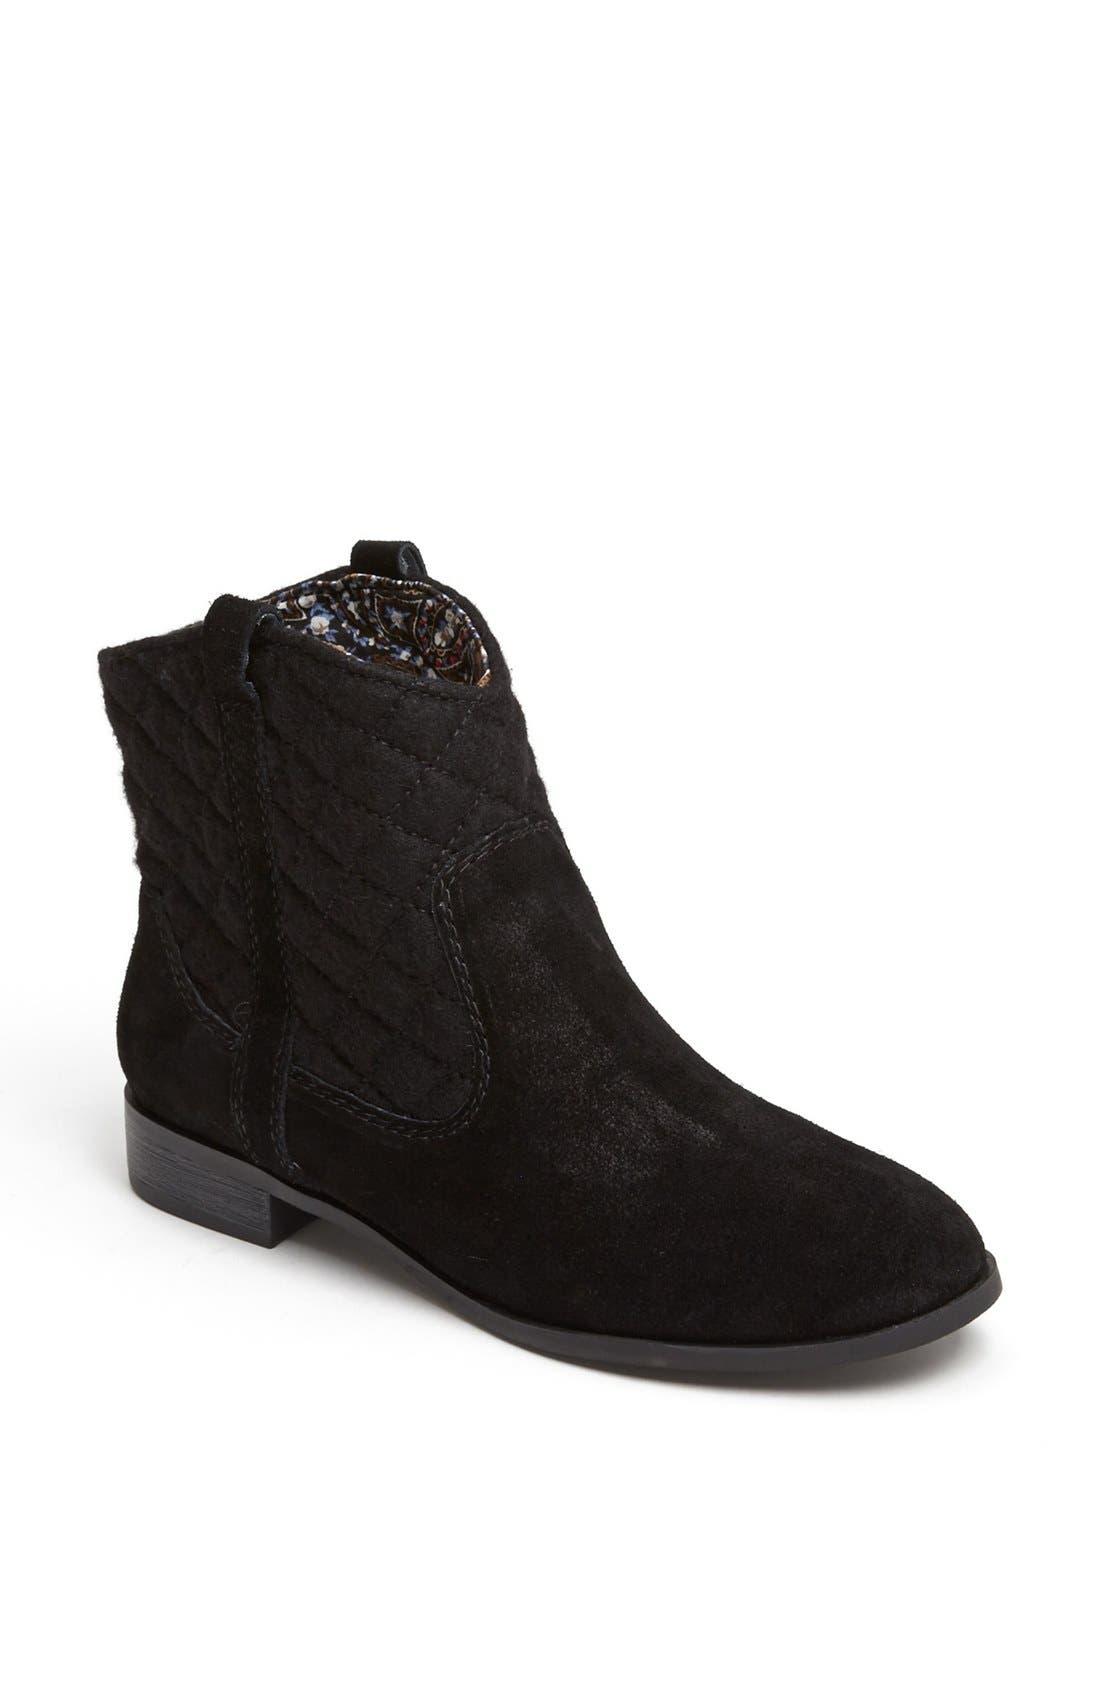 Main Image - BC Footwear 'Bad to the Bone' Boot